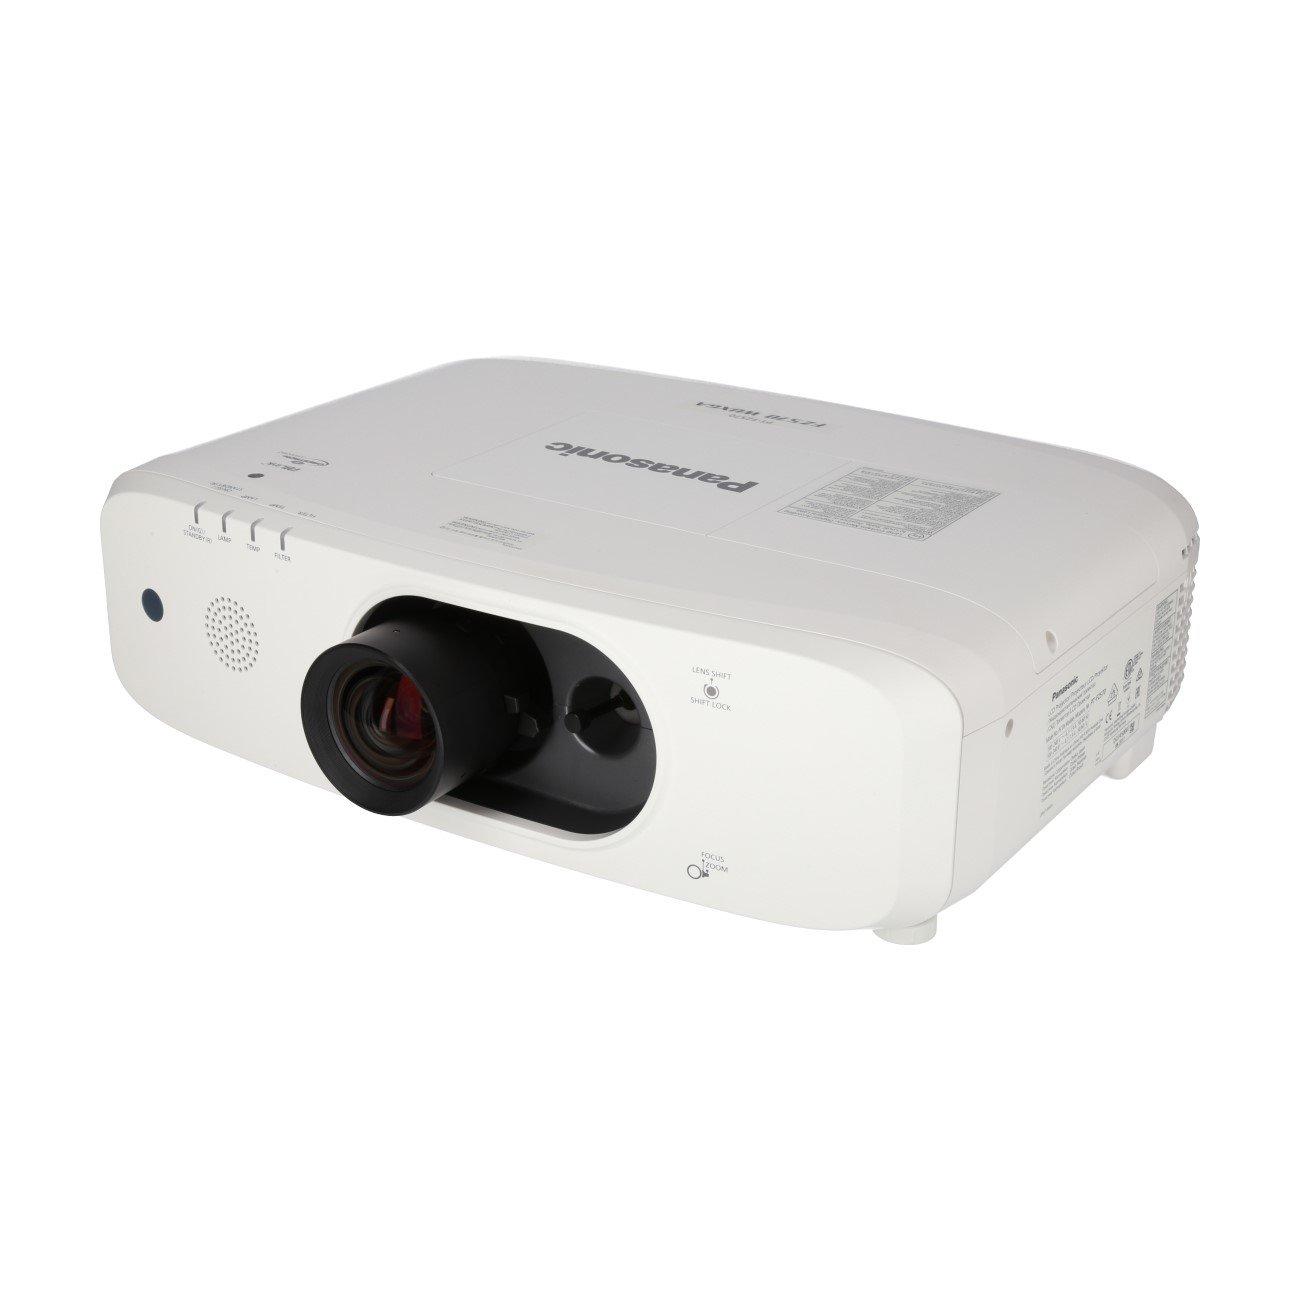 Projectors 3LCD WUXGA 4500 ANSI Lumens Projector